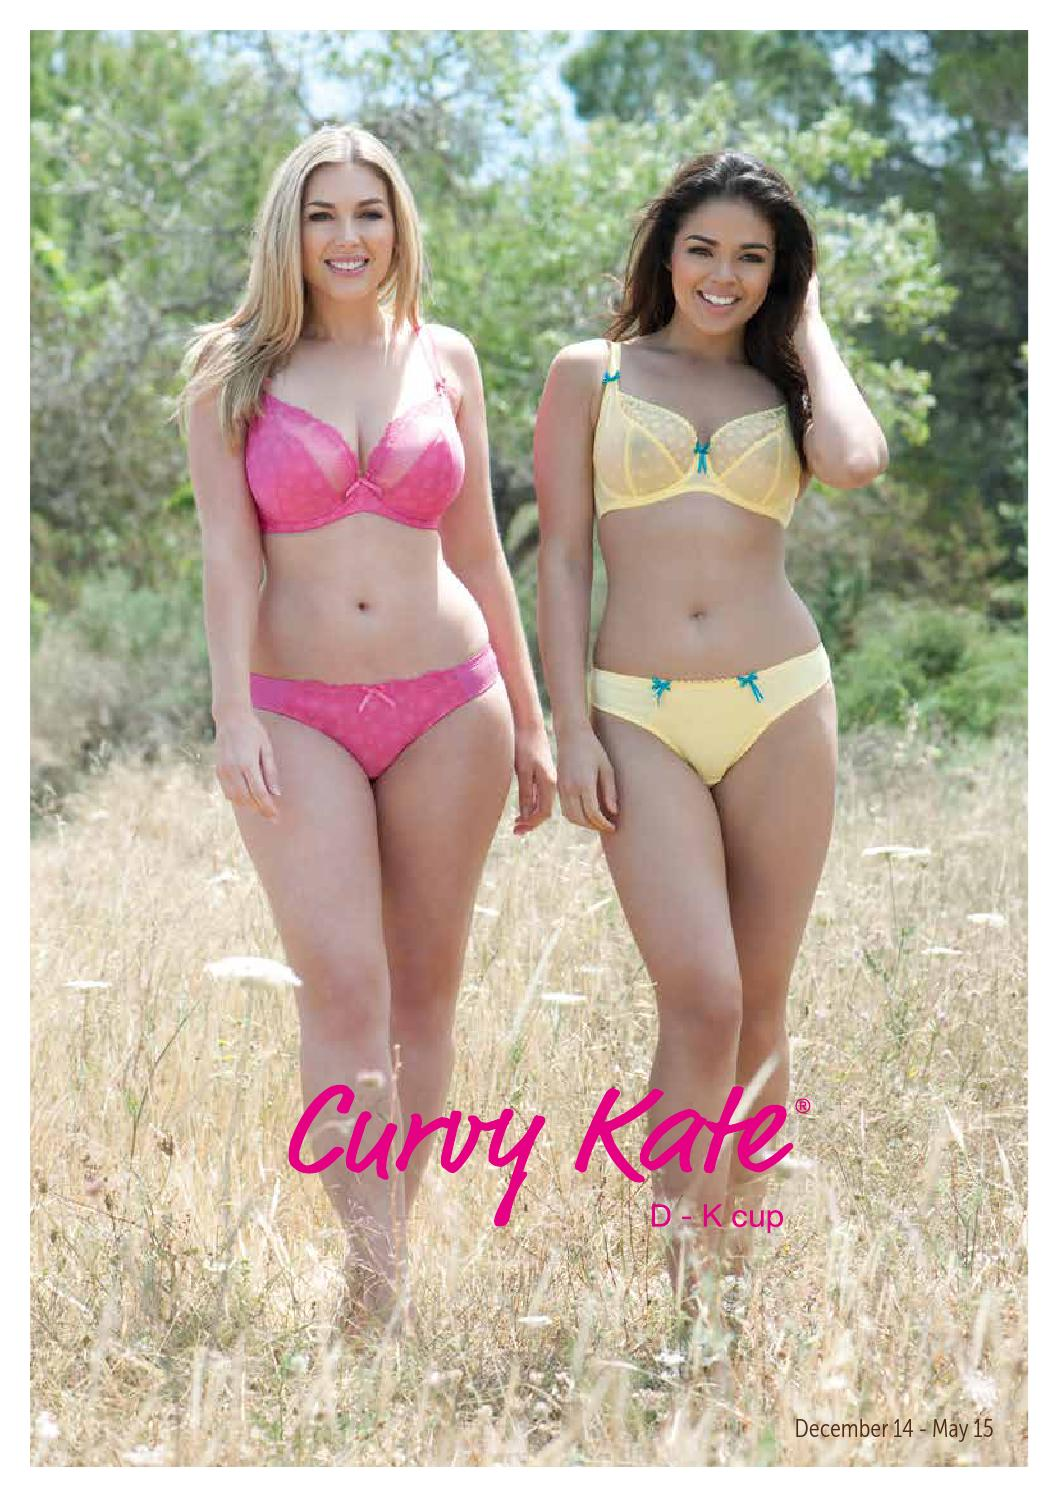 e49b1f9606b Curvy kate spring summer 2015 by Prisma Intimate Apparel - issuu